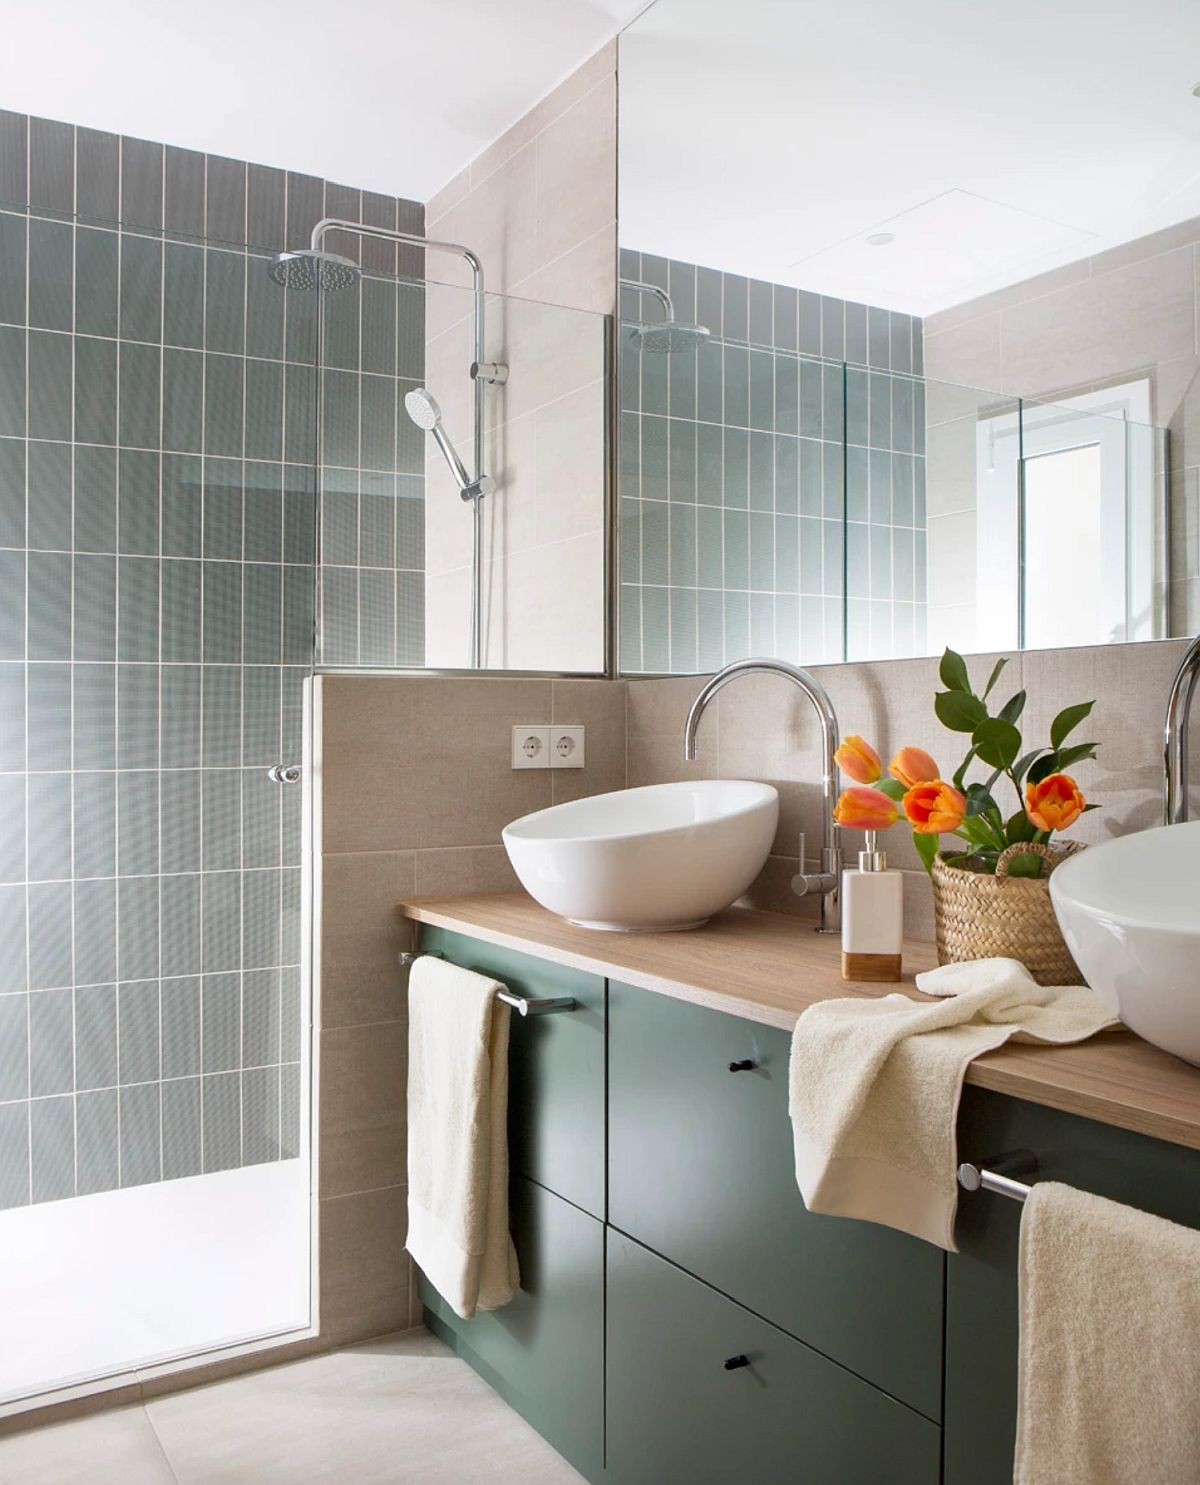 adelaparvu.com despre apartament cu bucatarie separata, design Paz de Tord, Foto Jordi Canosa (9)